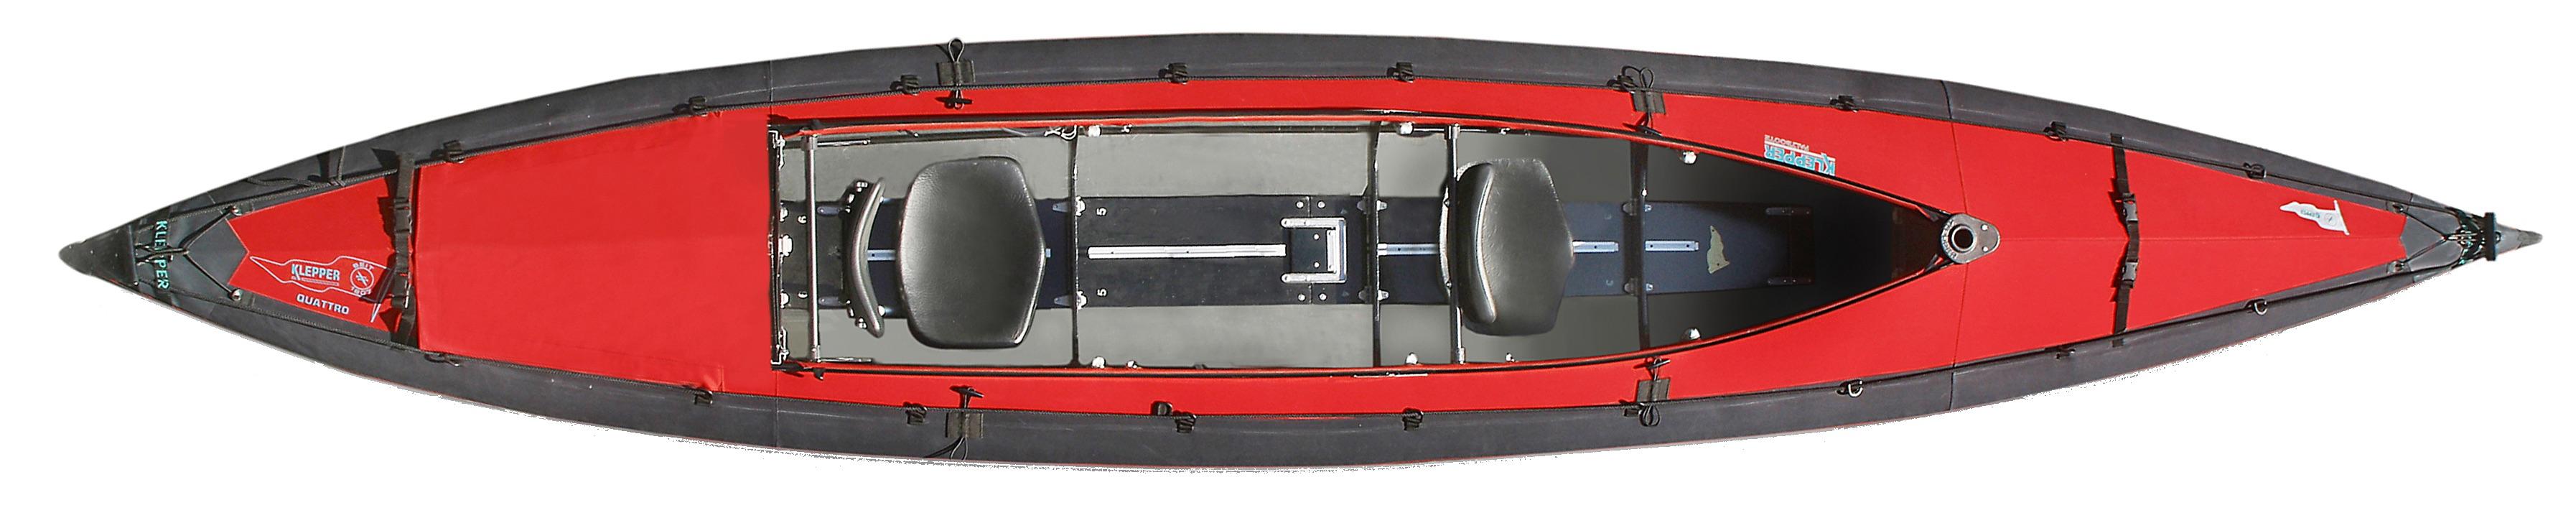 Aerius II 545 Quattro - Klepper Folding Kayaks official